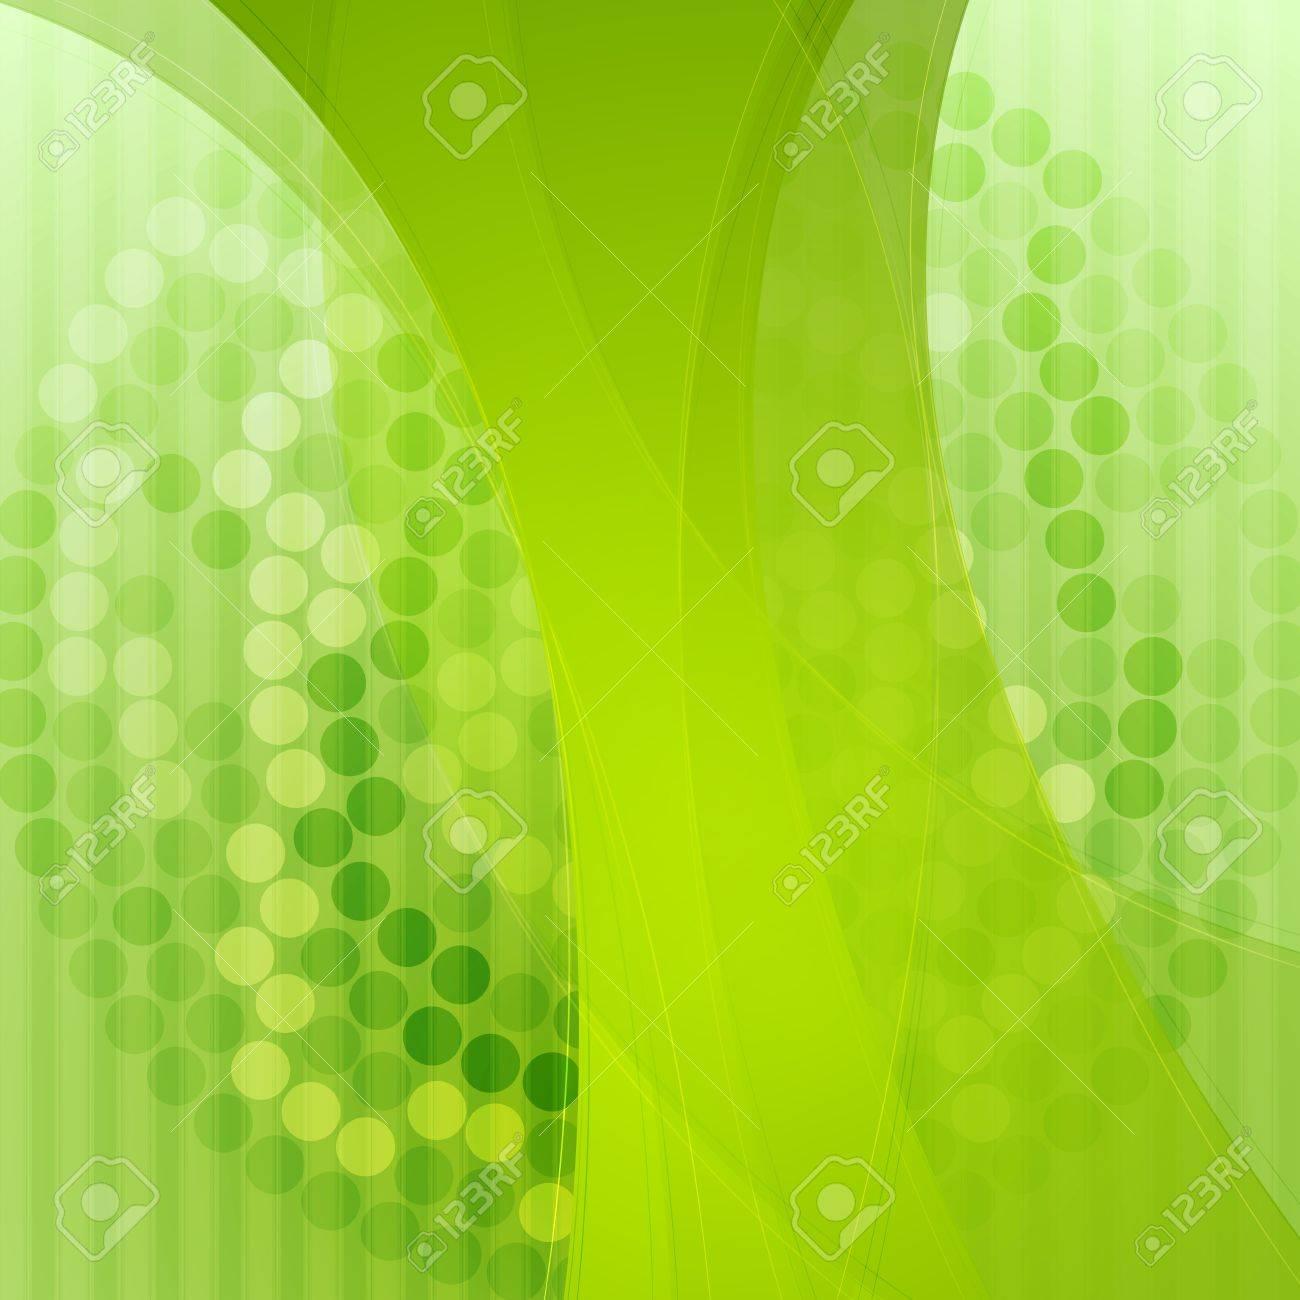 Light Green Abstract Design Abstract Elegant Light Green